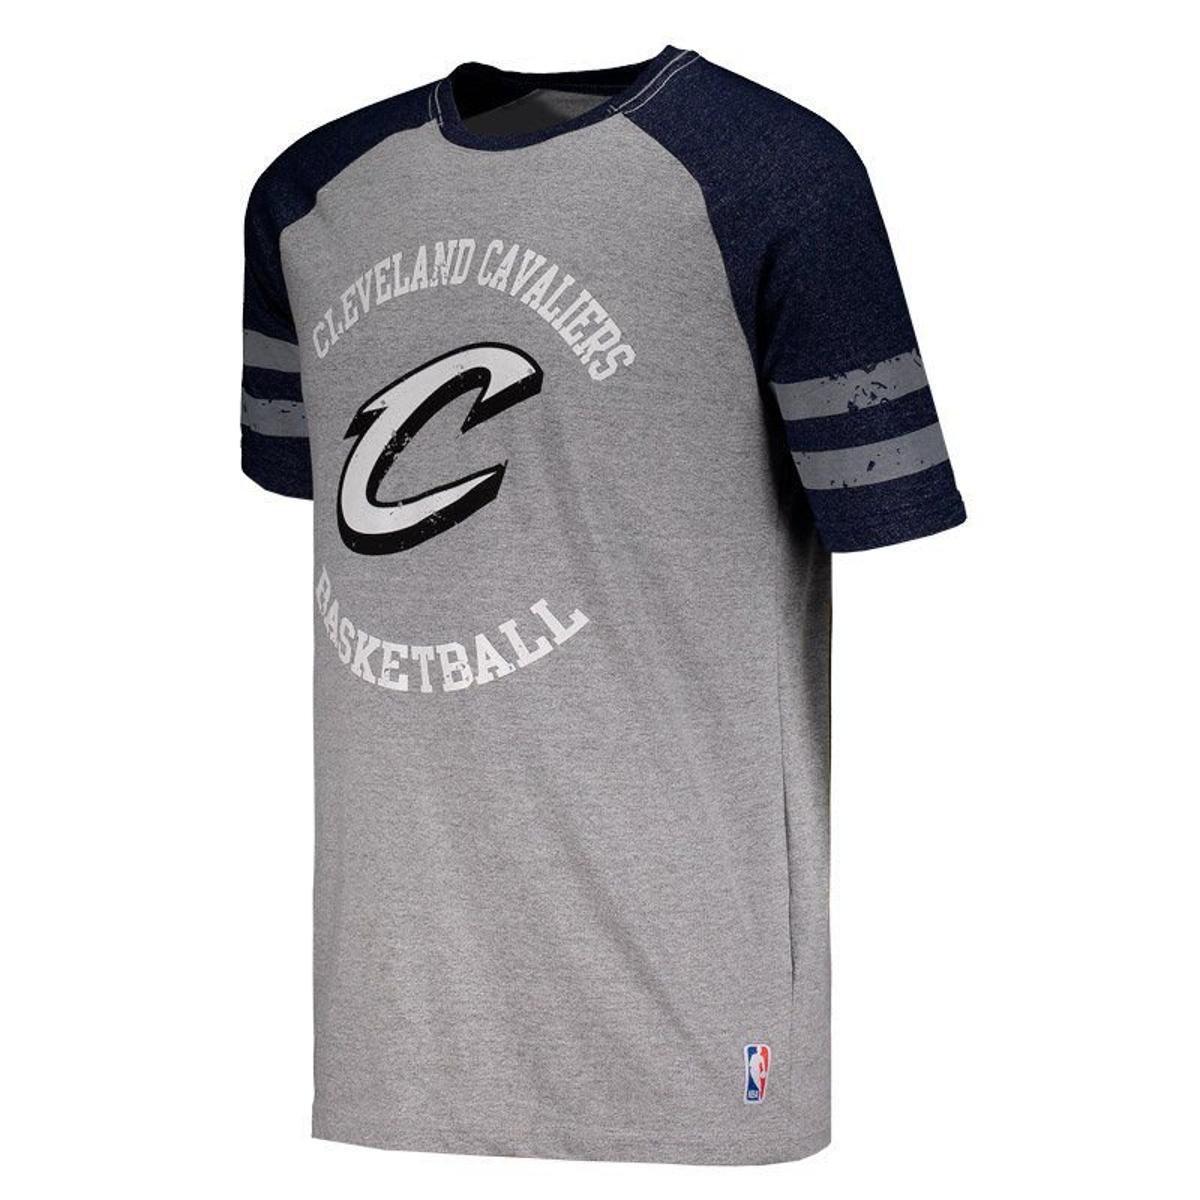 Camiseta Mitchell   Ness NBA Cleveland Cavaliers Masculina - Cinza ... f89cc0cb1a0da